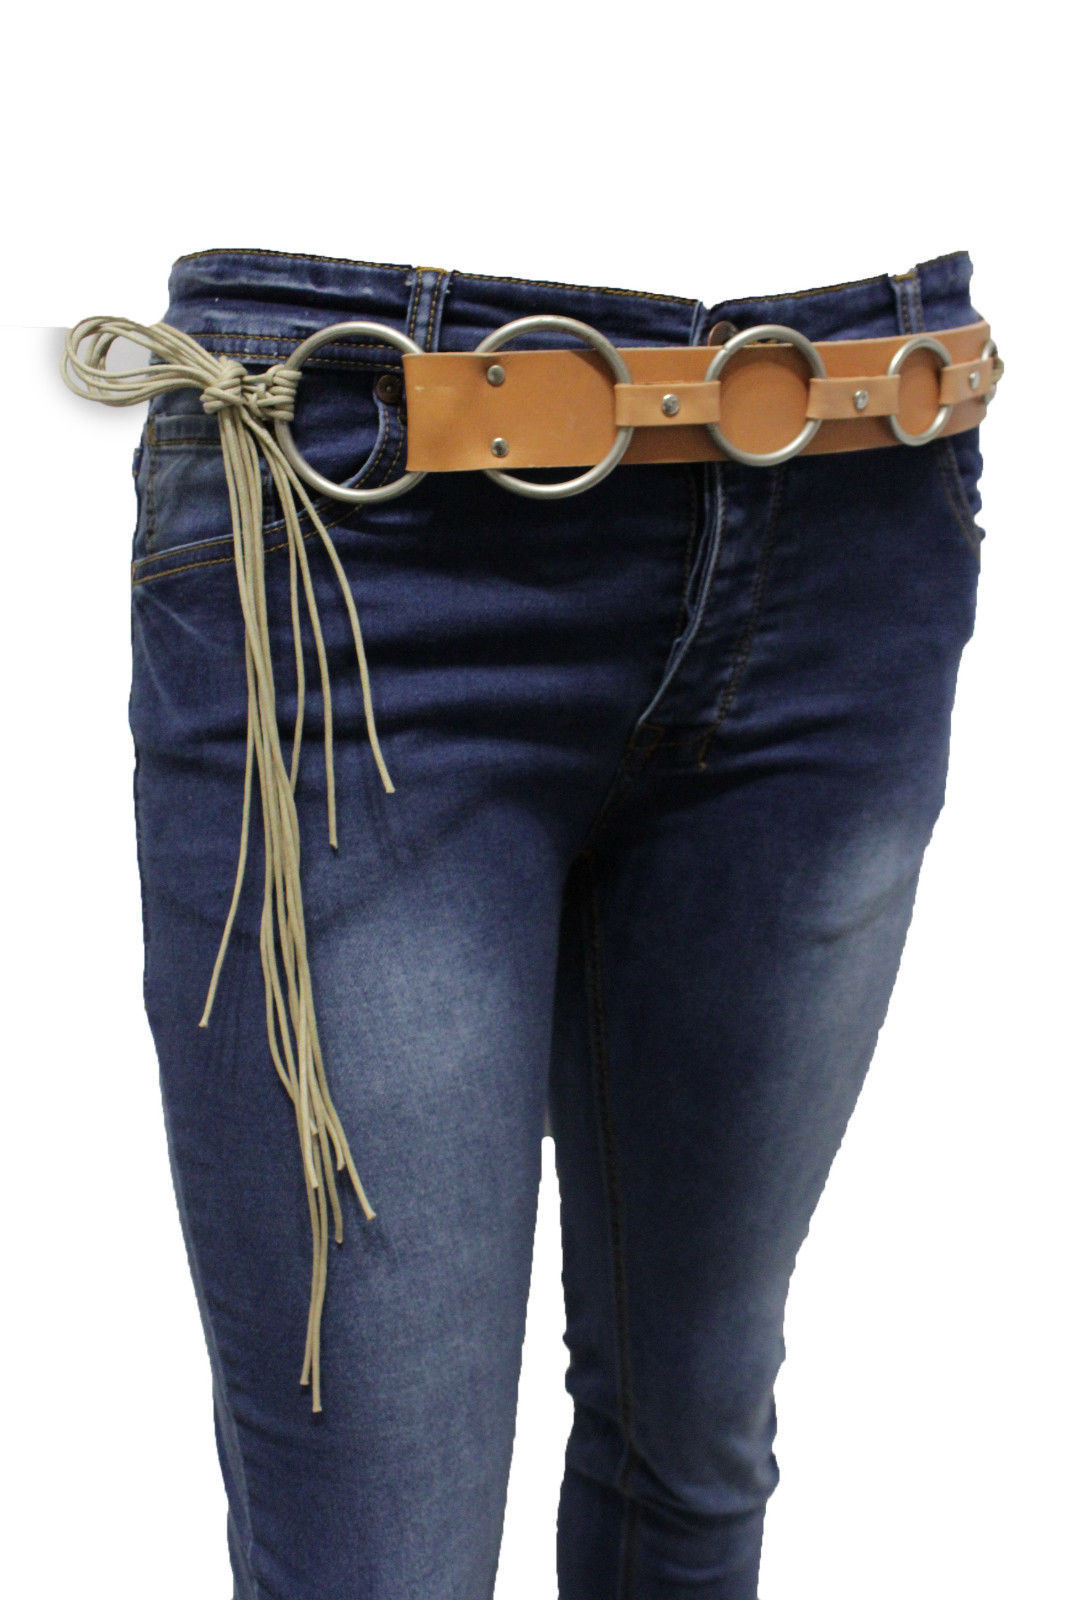 Damen Beige Kunstleder West Lang Fransen Tie Modischer Gürtel Silberring S M L